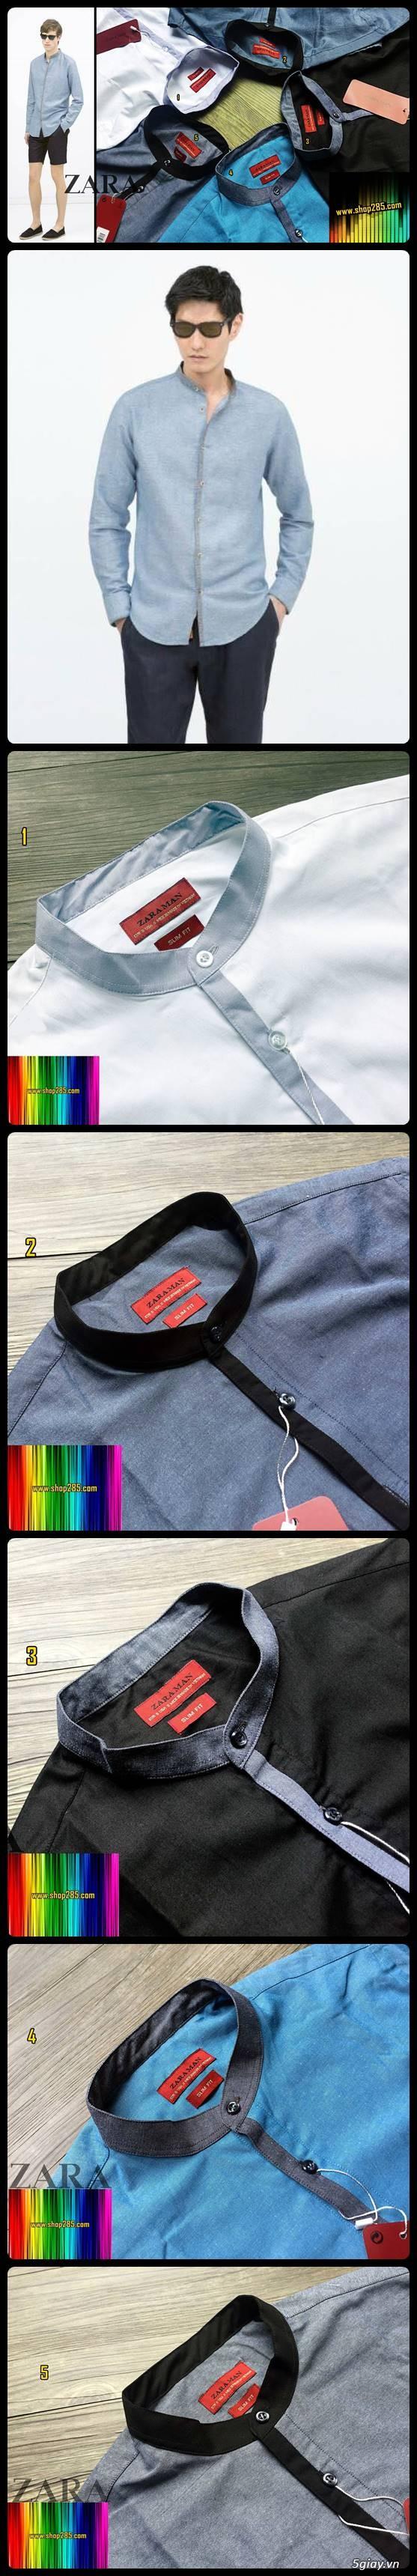 Áo thun Hollister VNXK,áo thun SuperDry VNXK ,áo A&F VNXK ,áo thun cổ tim thun láng - 10